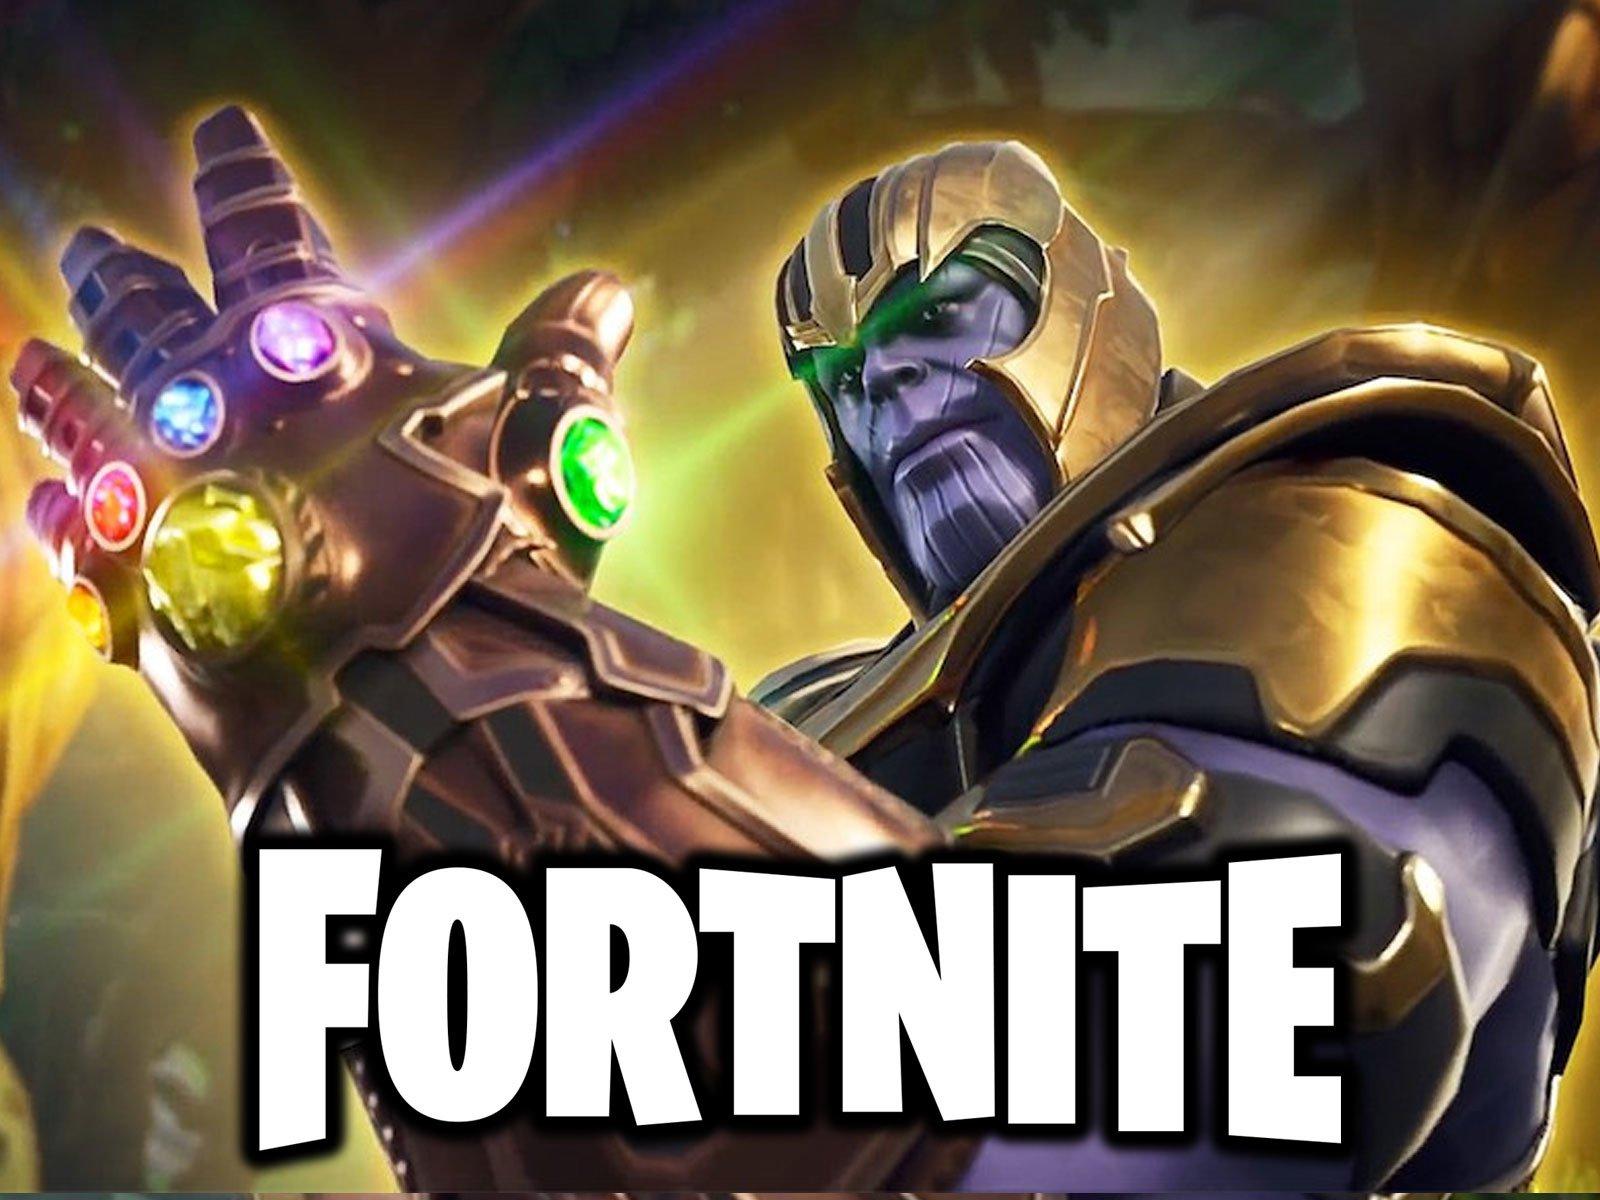 Endgame Fortnite Clip Amazon Com Clip Fortnite Season 4 Gameplay Robert Thomas Paul